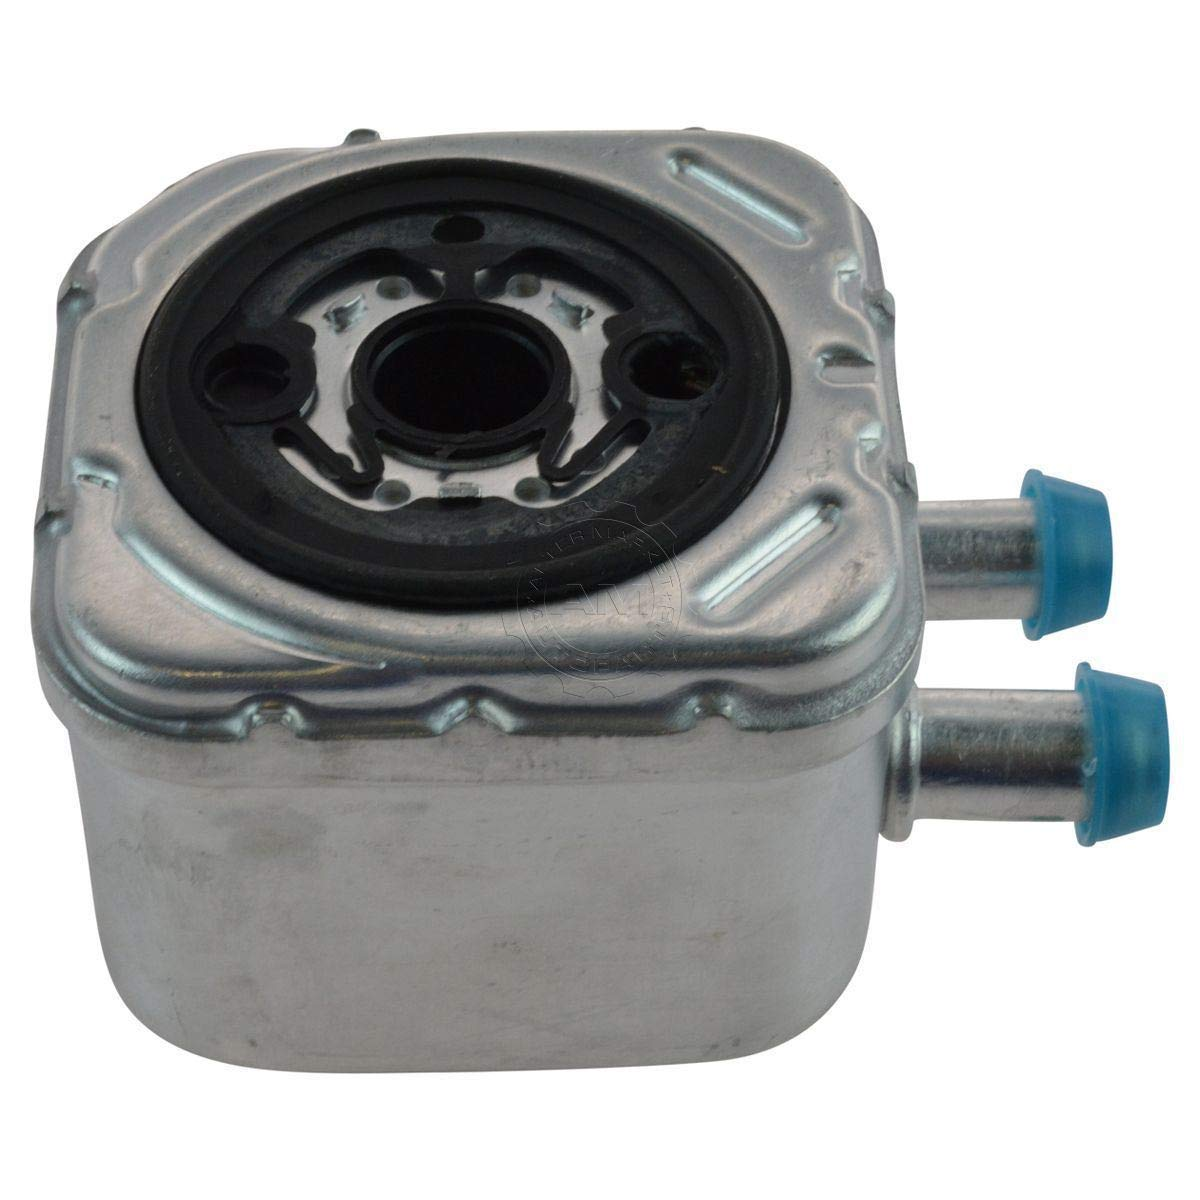 NEW Engine Oil Cooler Assembly For Audi S4 A4 A6 TT Allroad VW Passat 028117021E